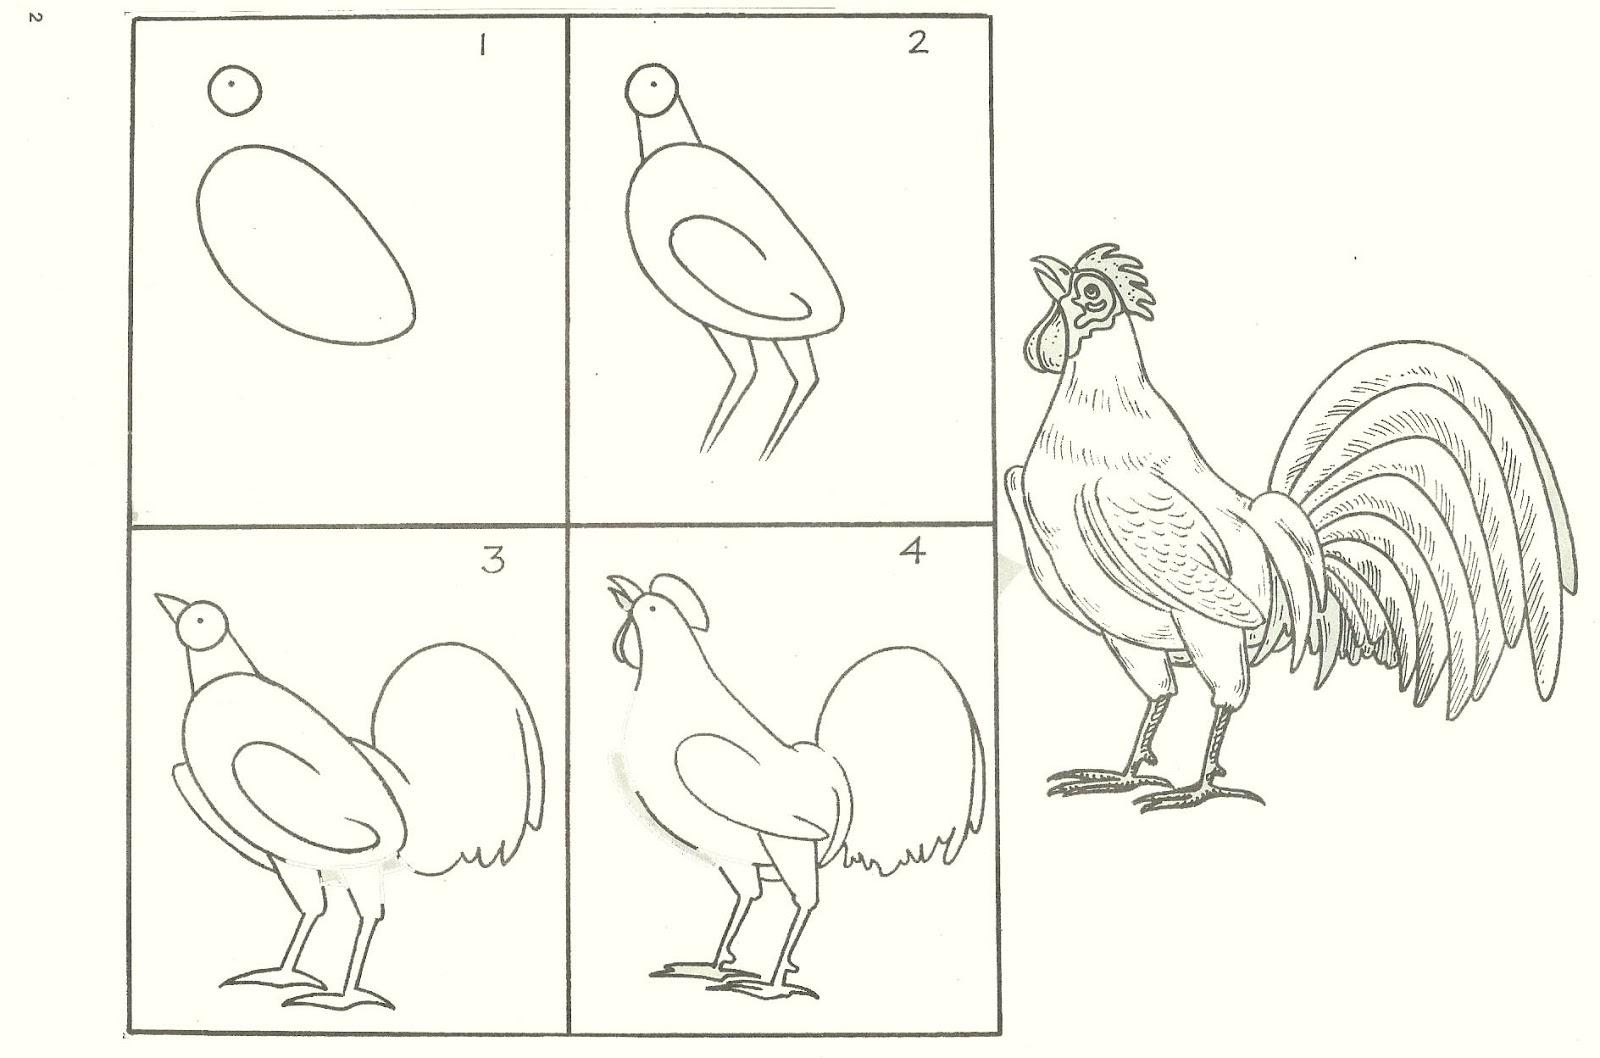 Studentsdrawing animal step by step easy outline drawing for Simple drawings step by step